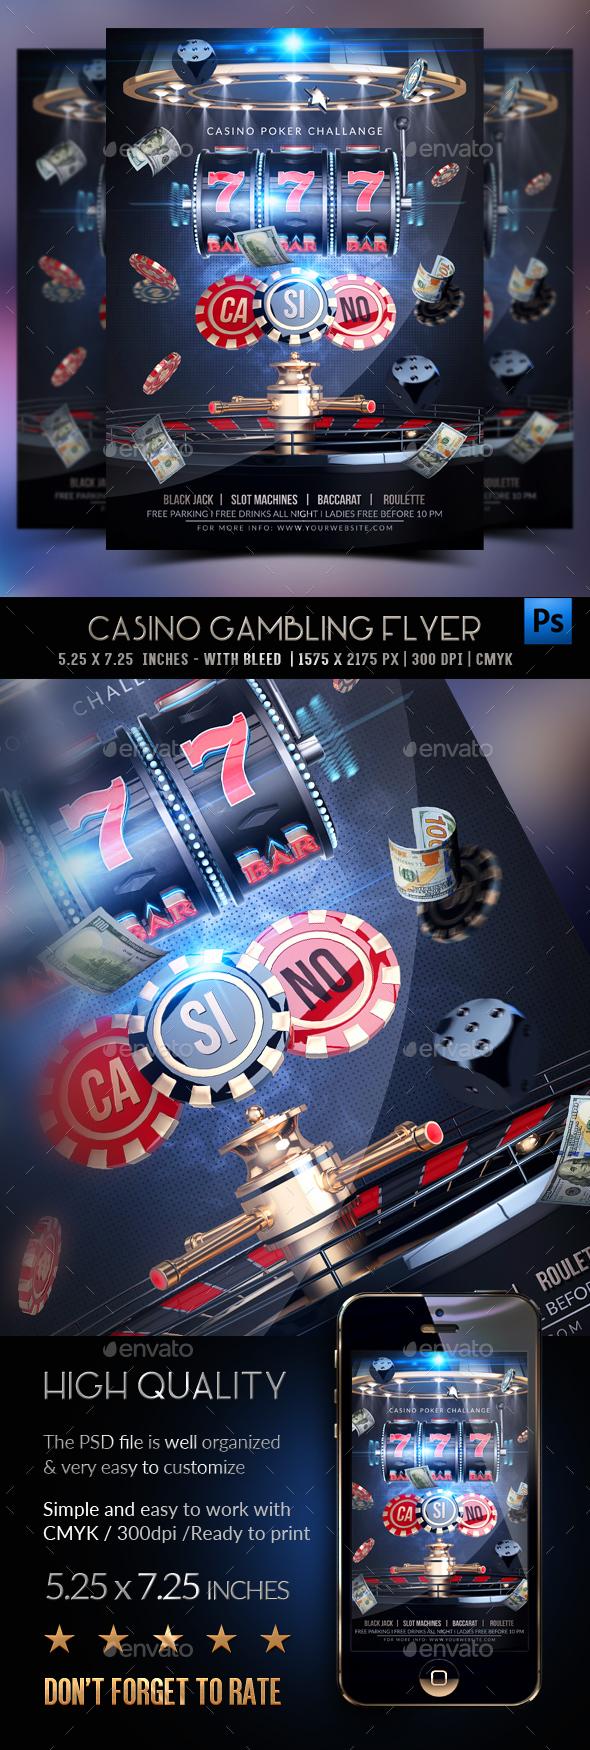 Casino Gambling Flyer